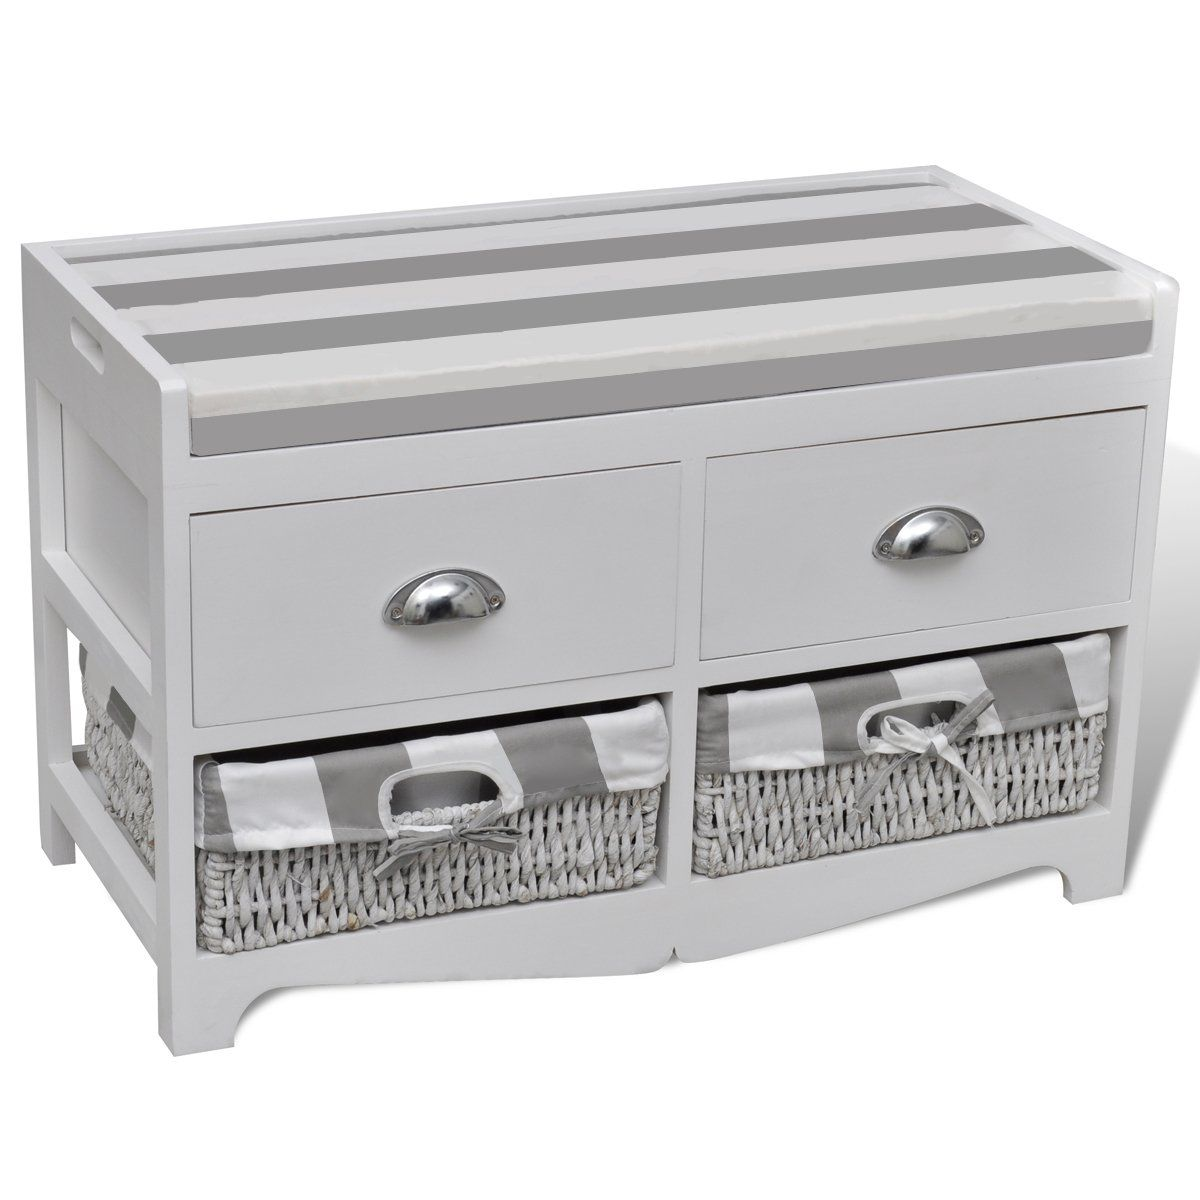 Banc de rangement avec 2 tiroirs et 2 paniers coussin for Rangement tiroirs cuisine